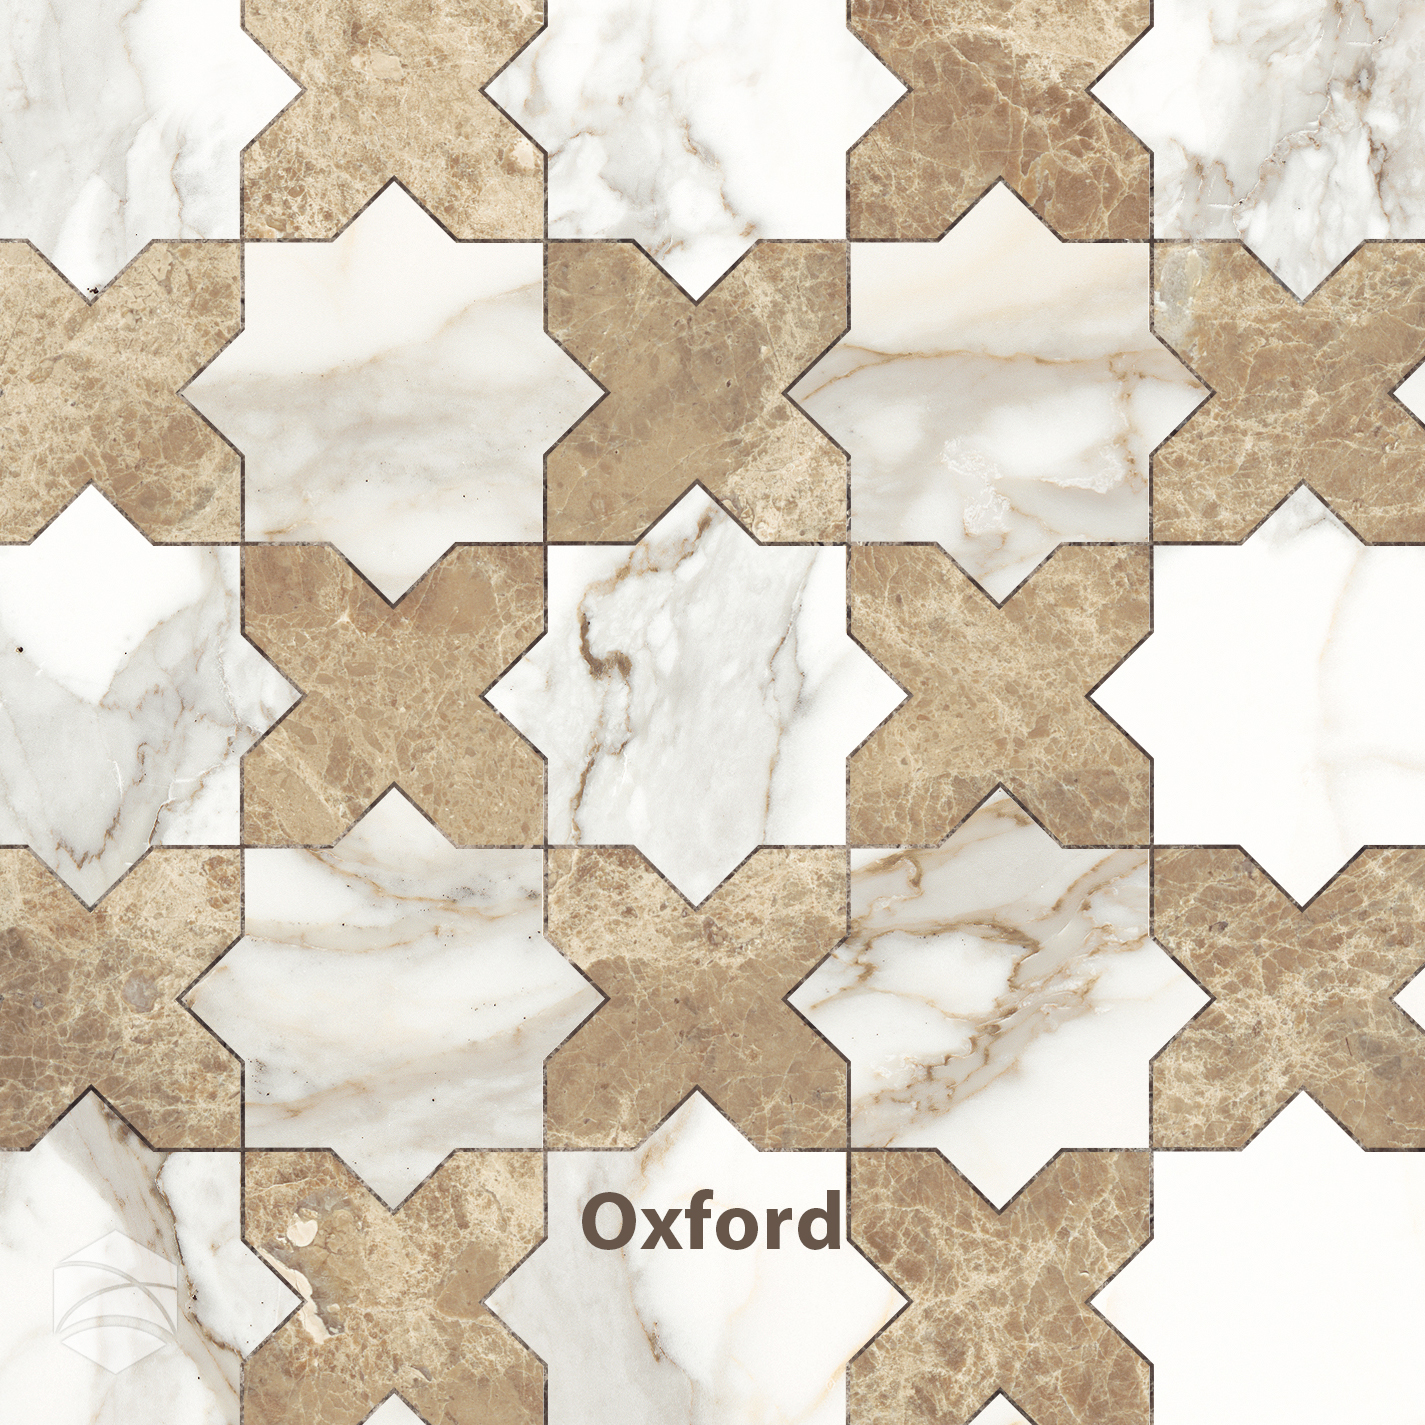 Oxford_V2_14x14.jpg